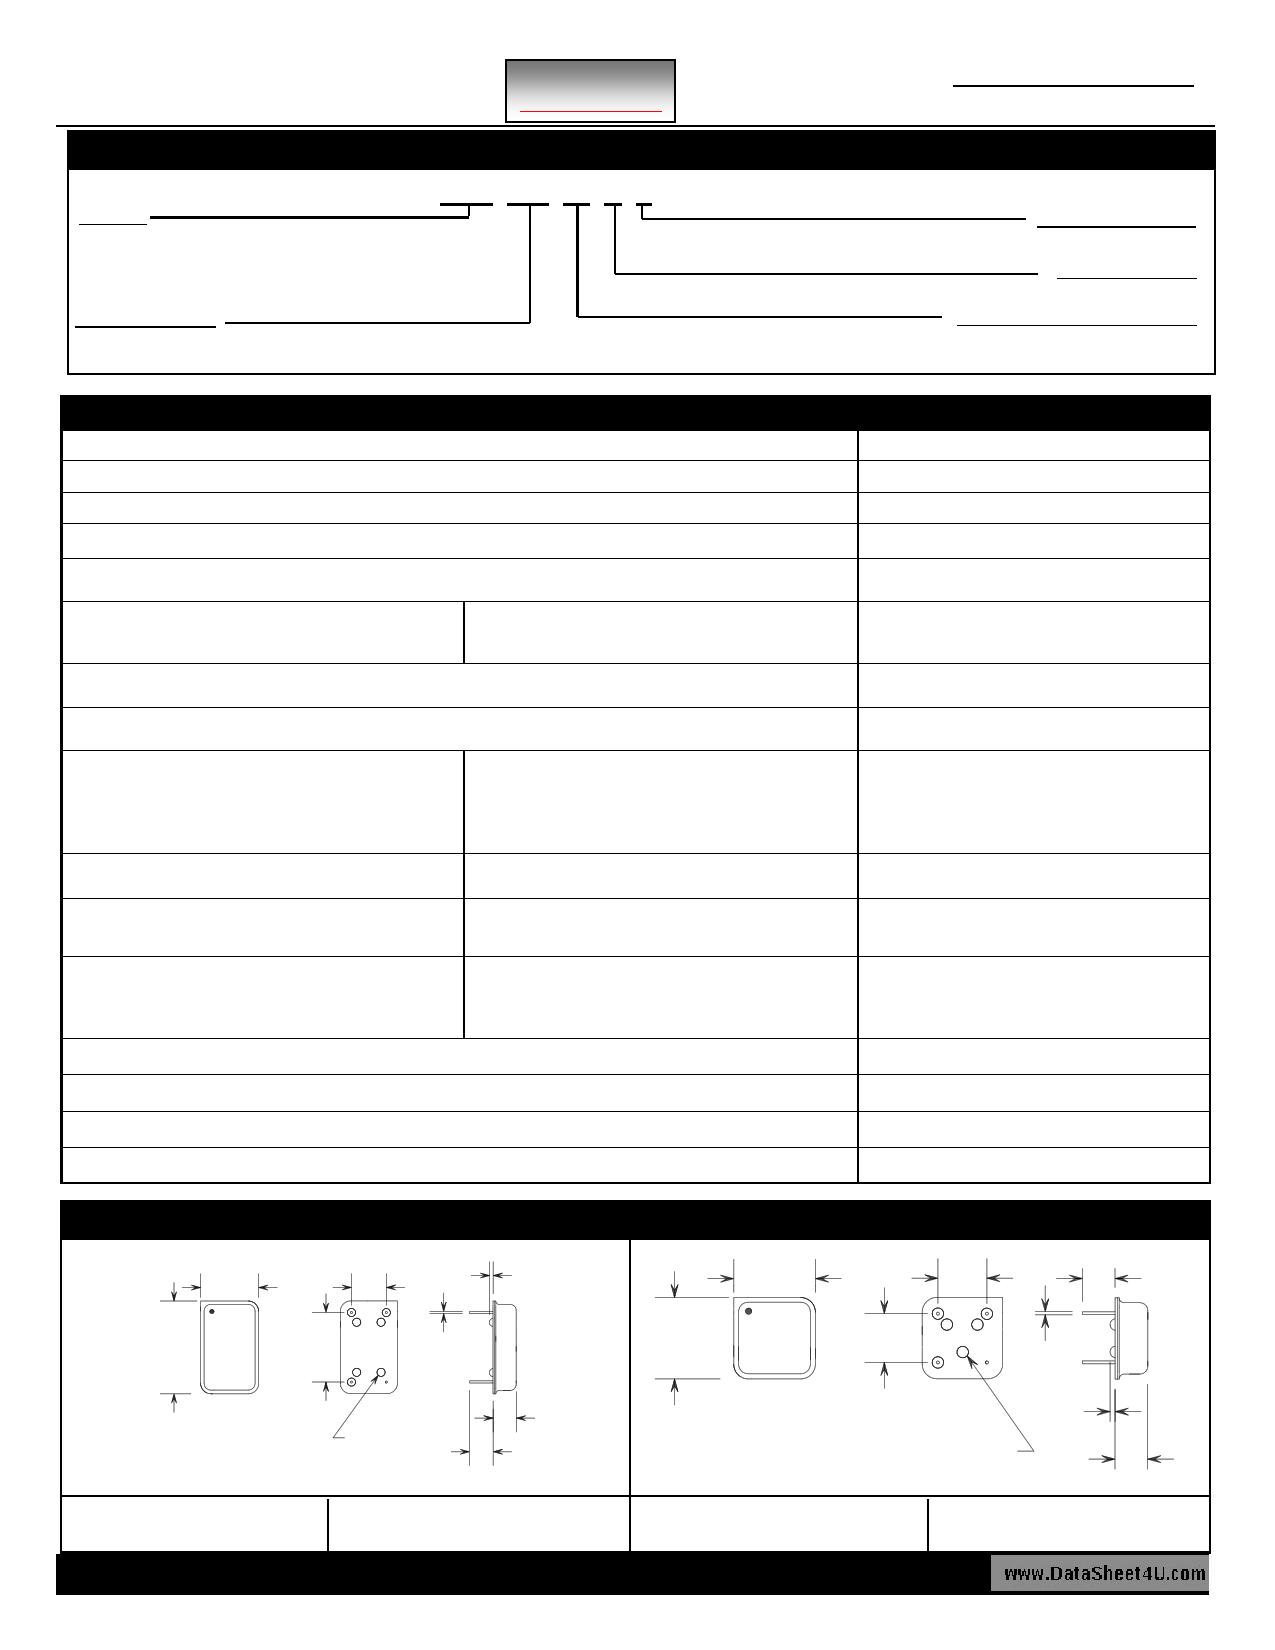 OAT3 datasheet